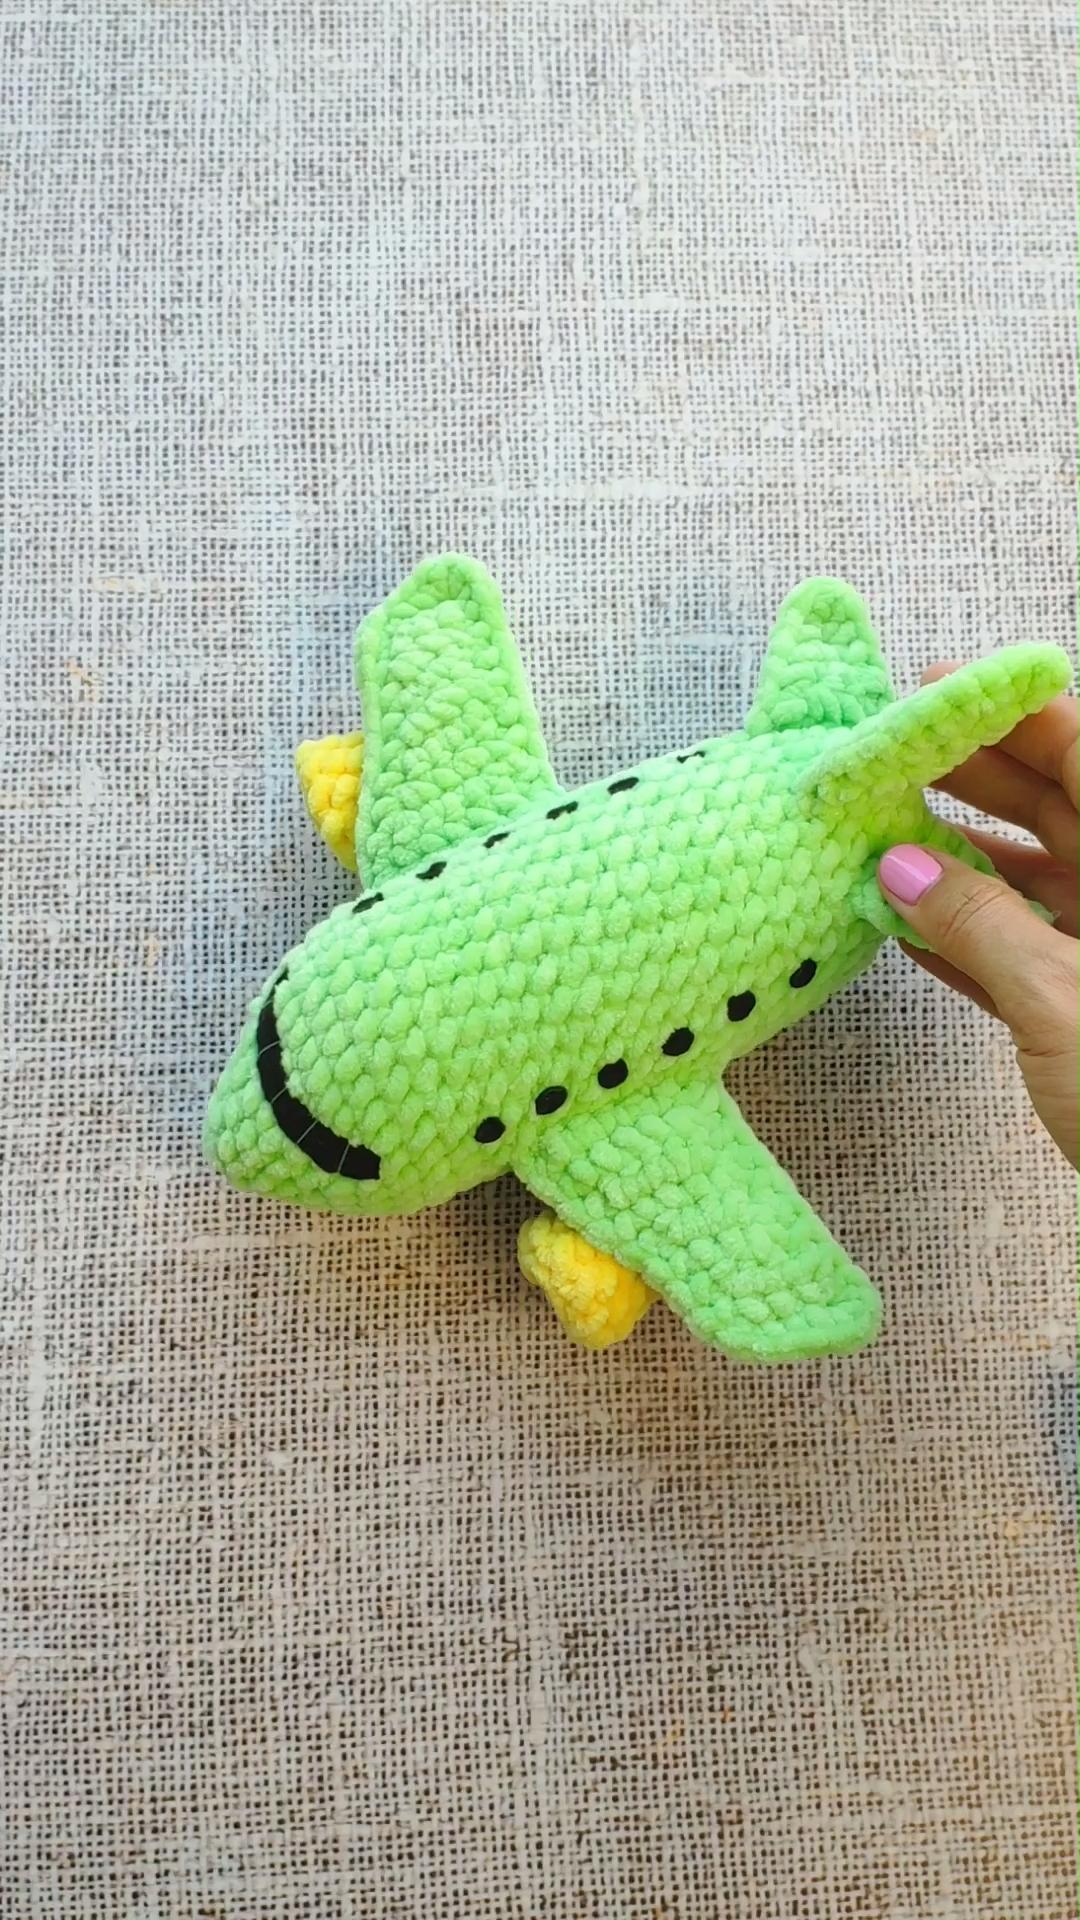 Photo of CROCHET PATTERN PLANE, Amigurumi pattern airplane toy, Crocheted aircraft toy, Crochet transport